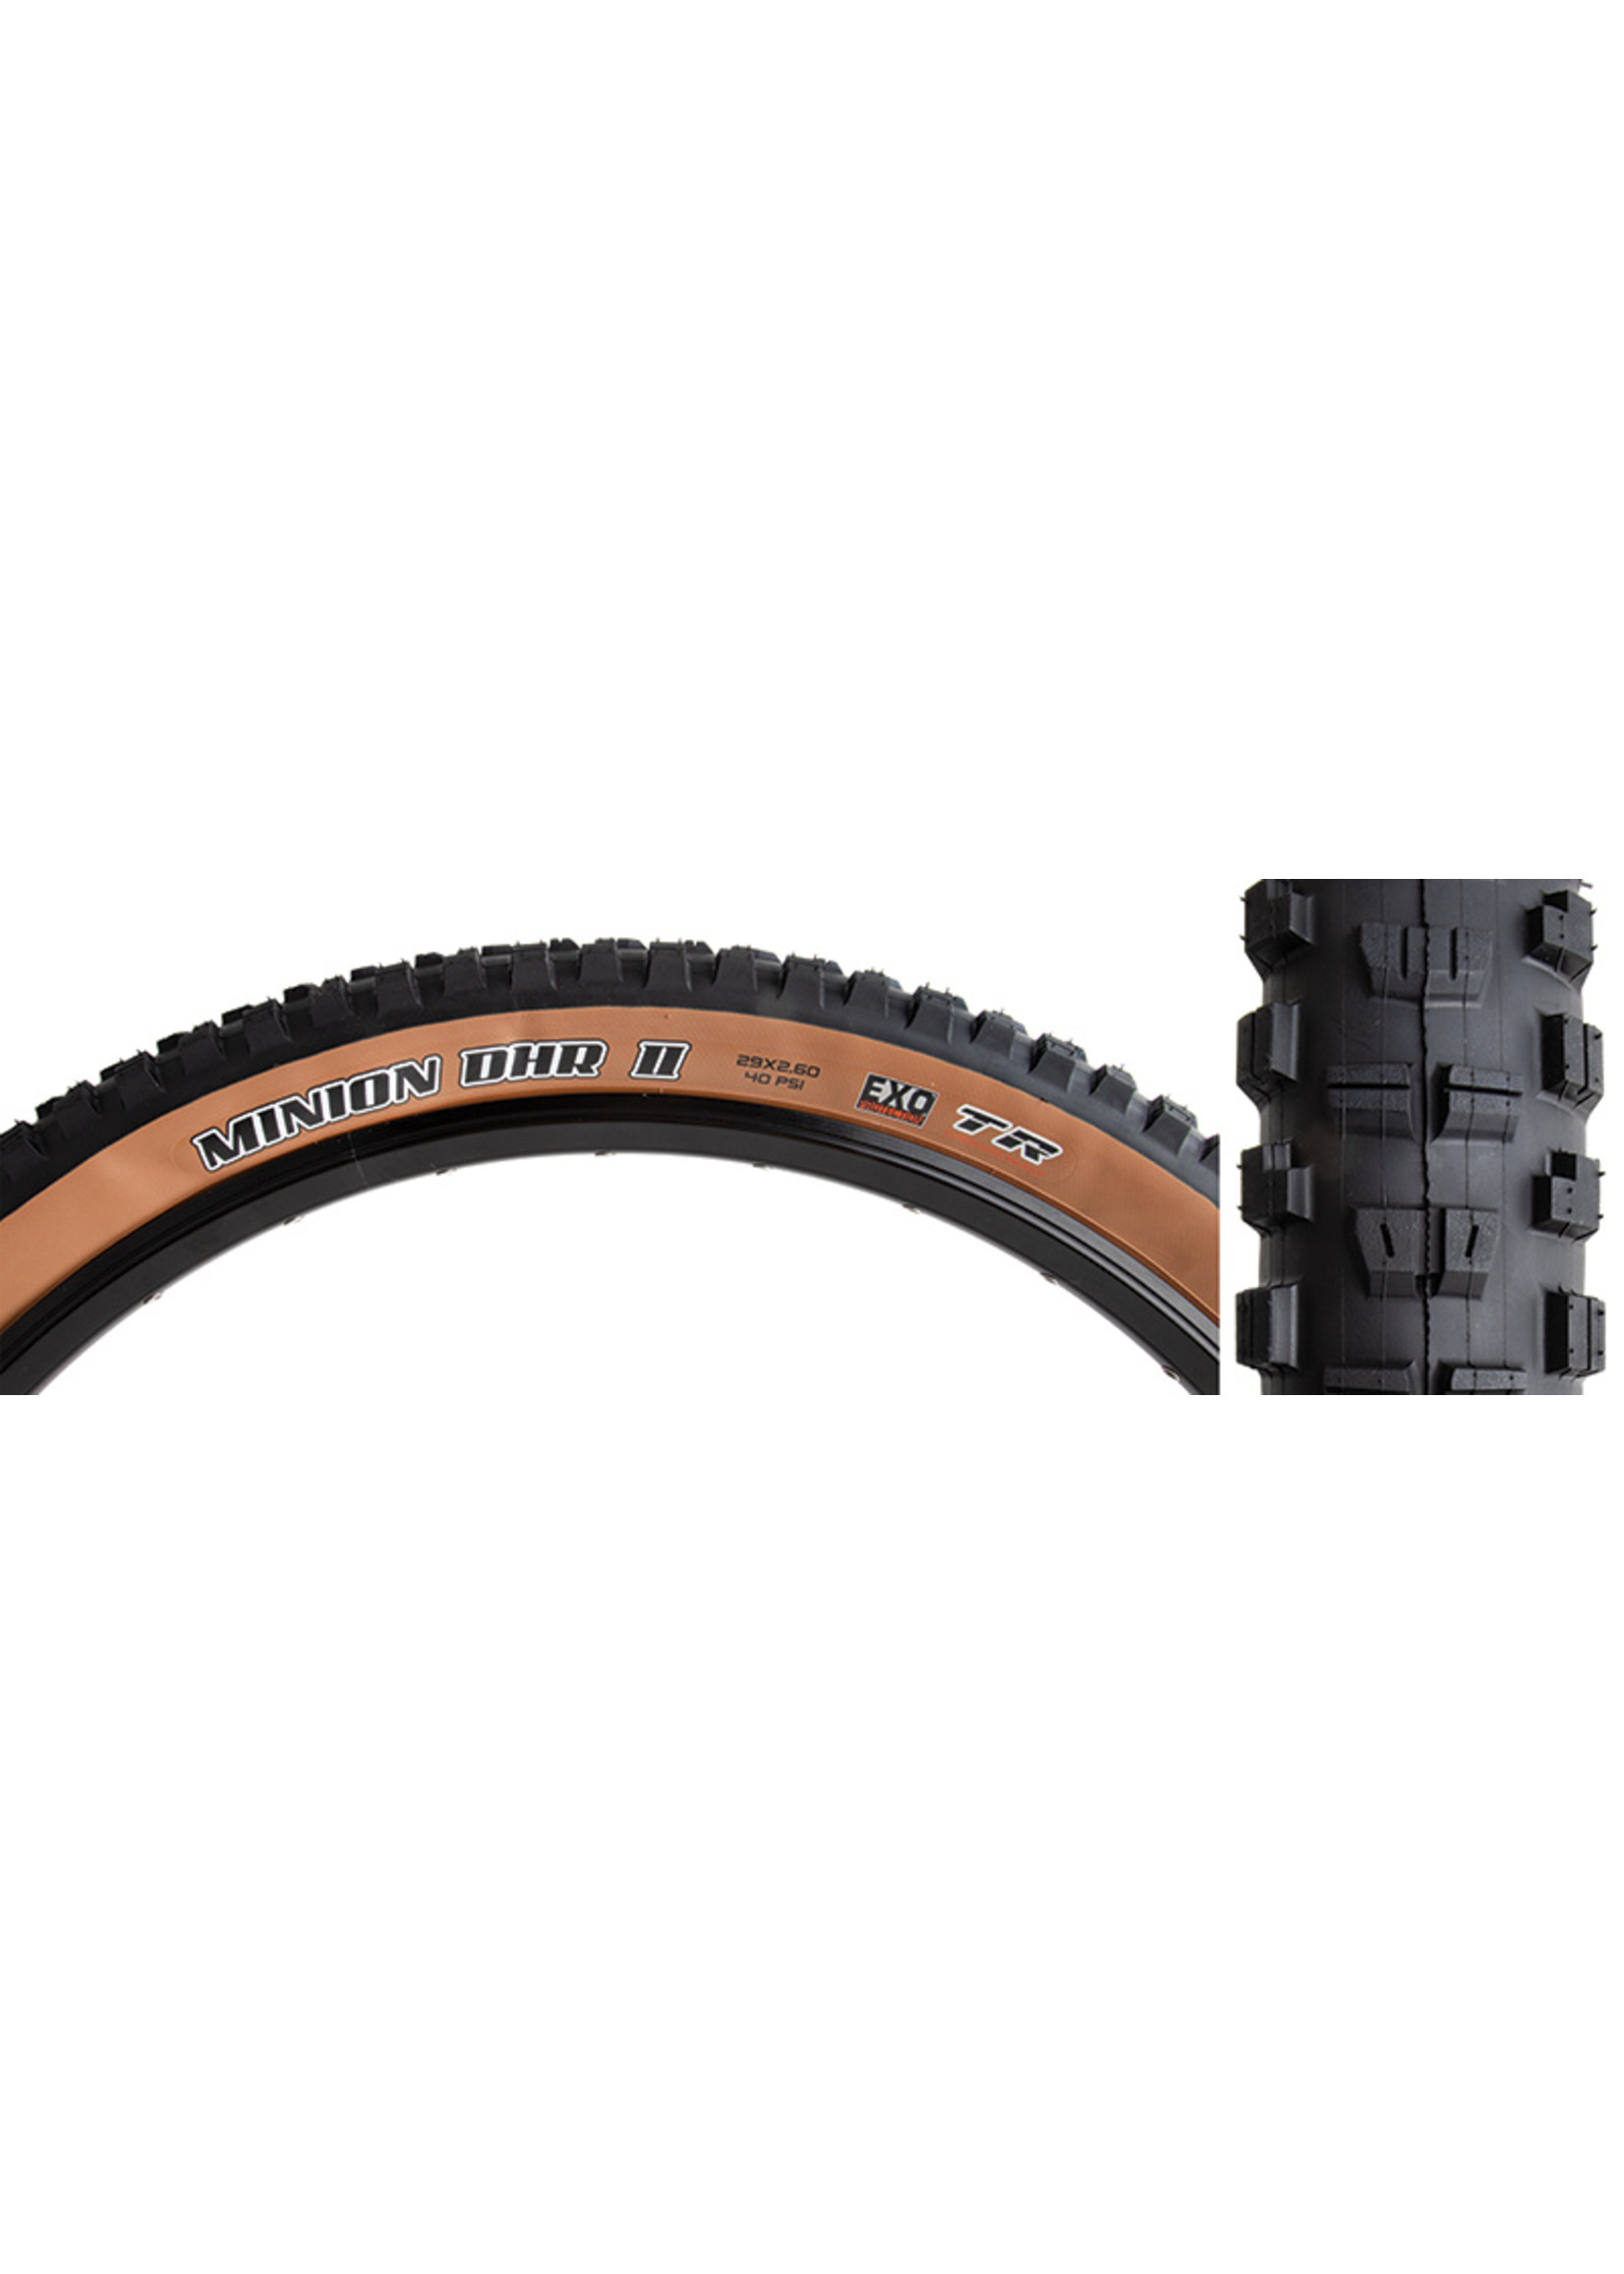 "MAXXIS Minion DHR 2 Tire, 29x2.6"" EXO/TR/WT Dk Tanwall"